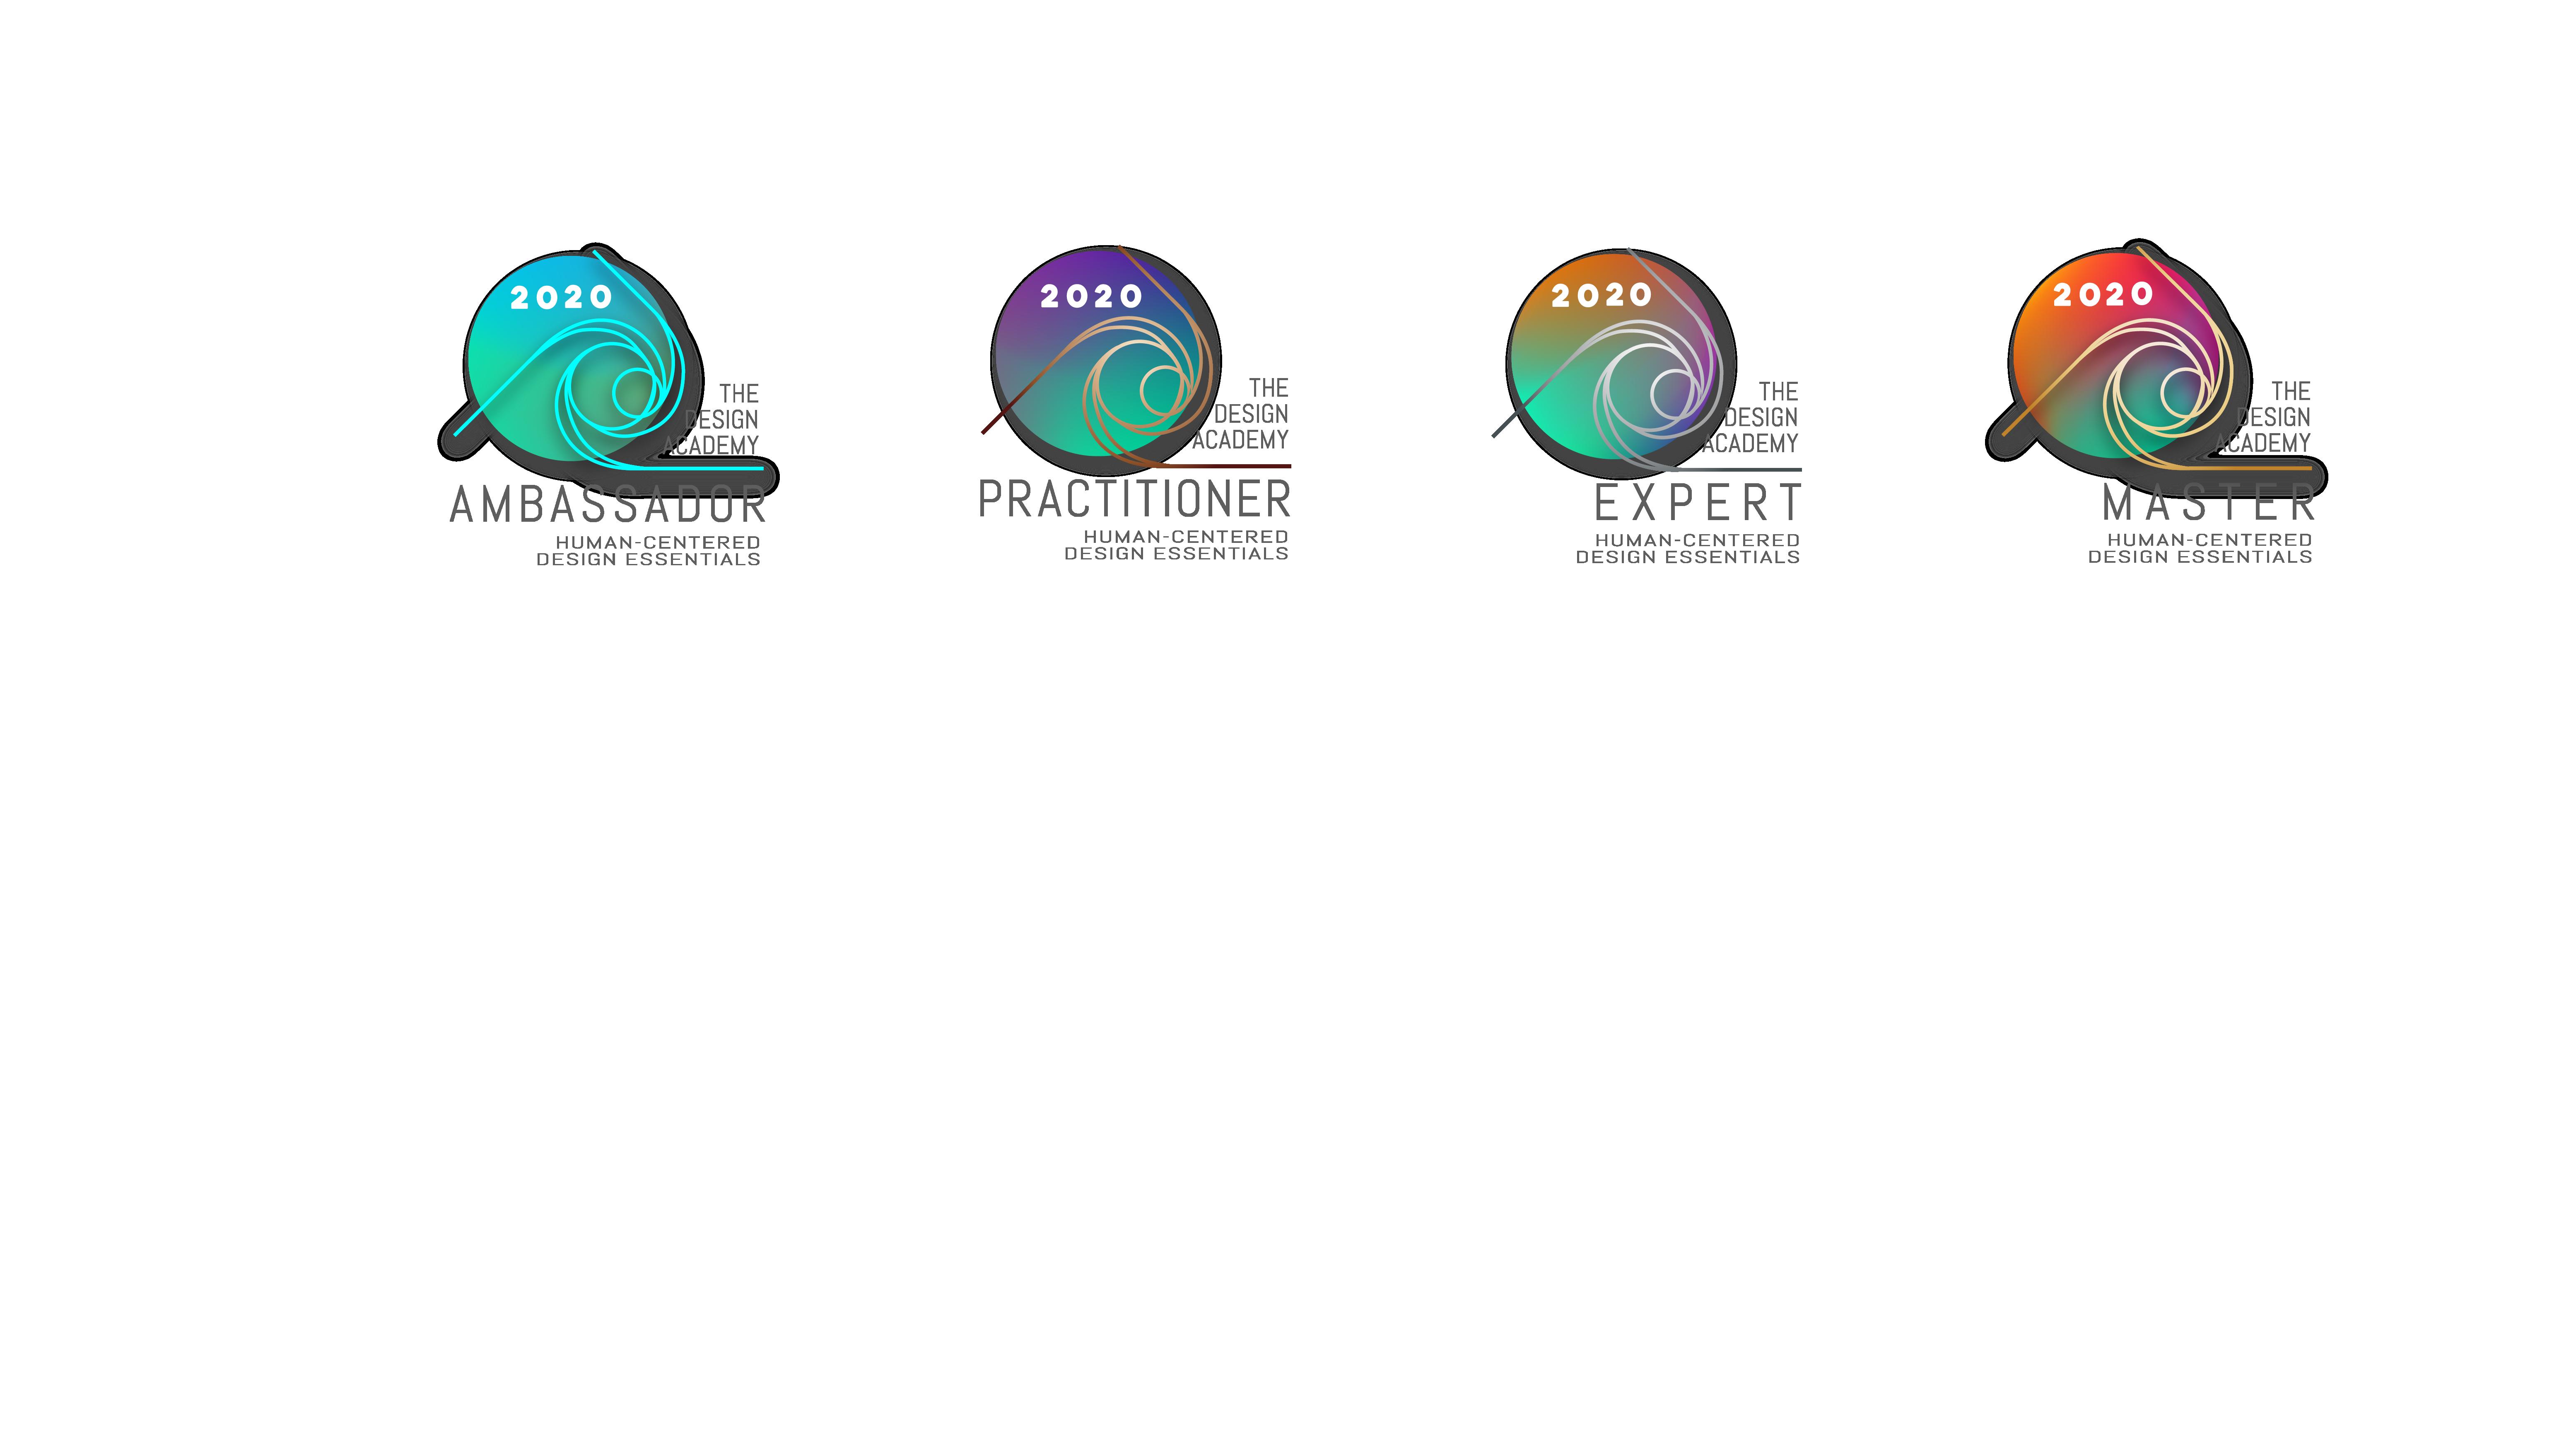 The Design Academy Essential Pathways Badges